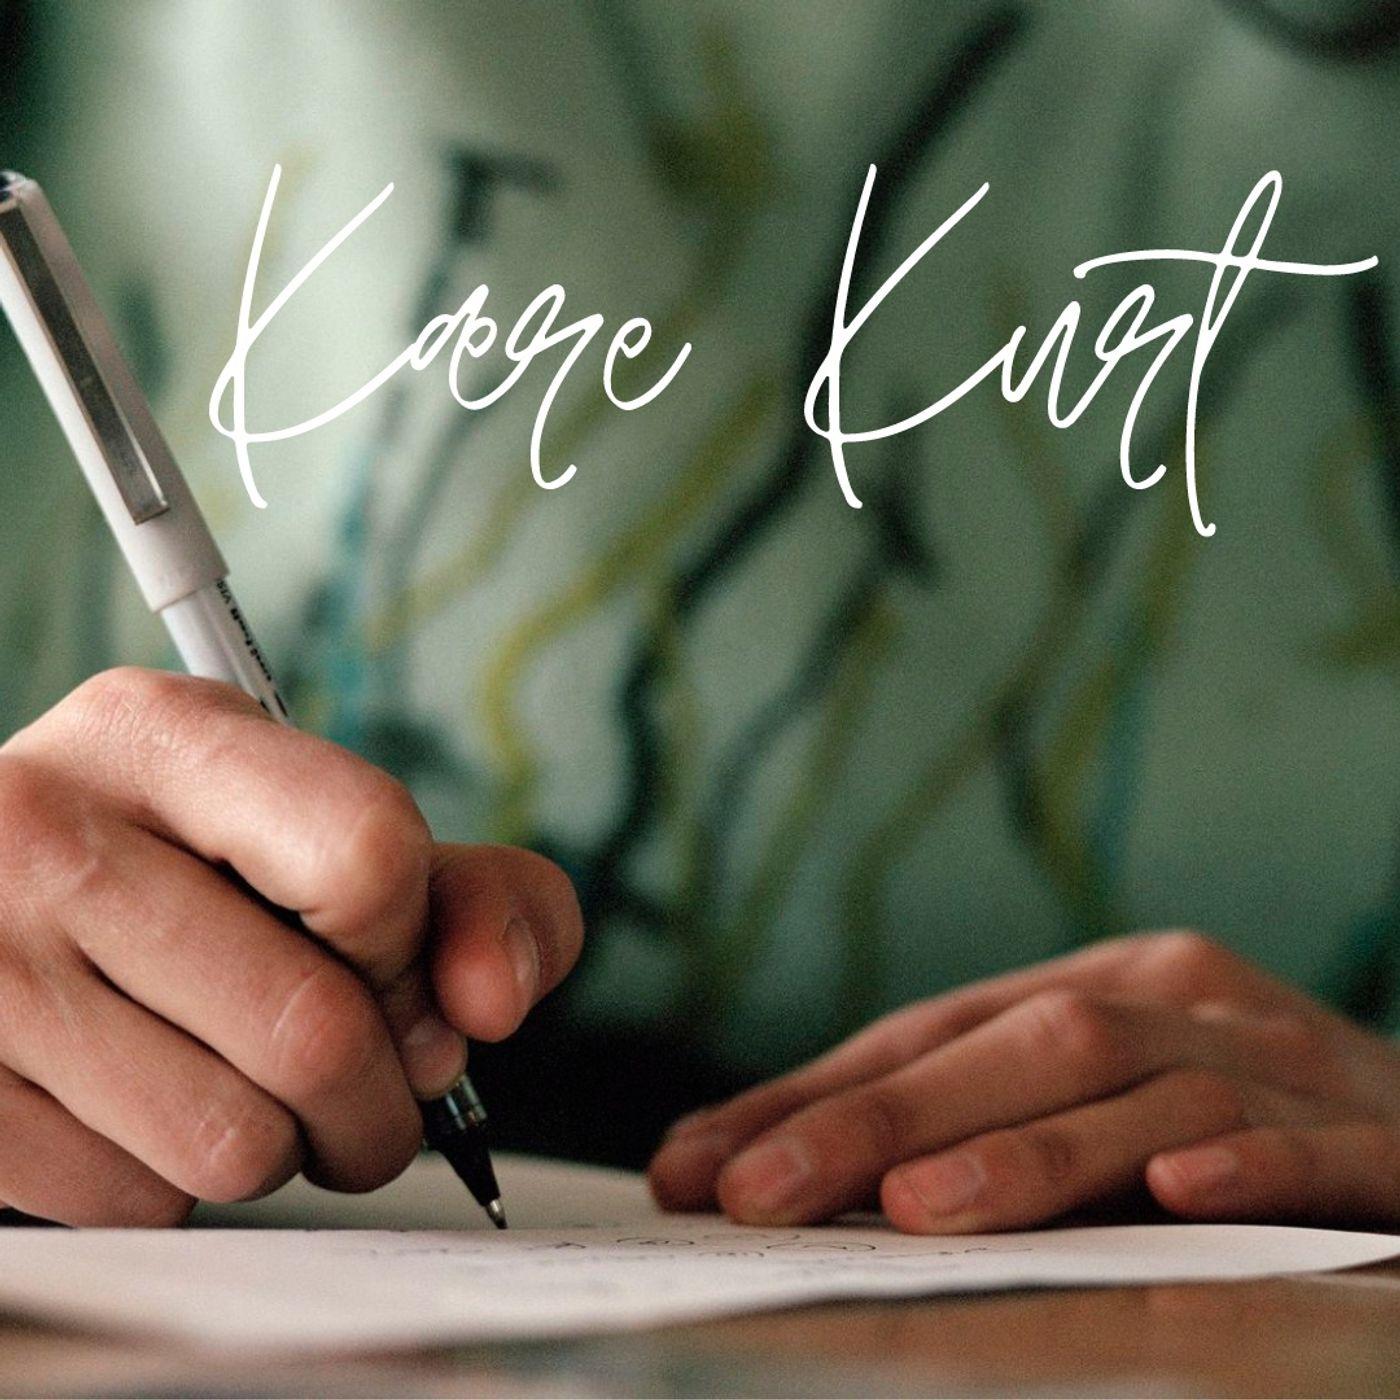 Kære Kurt...